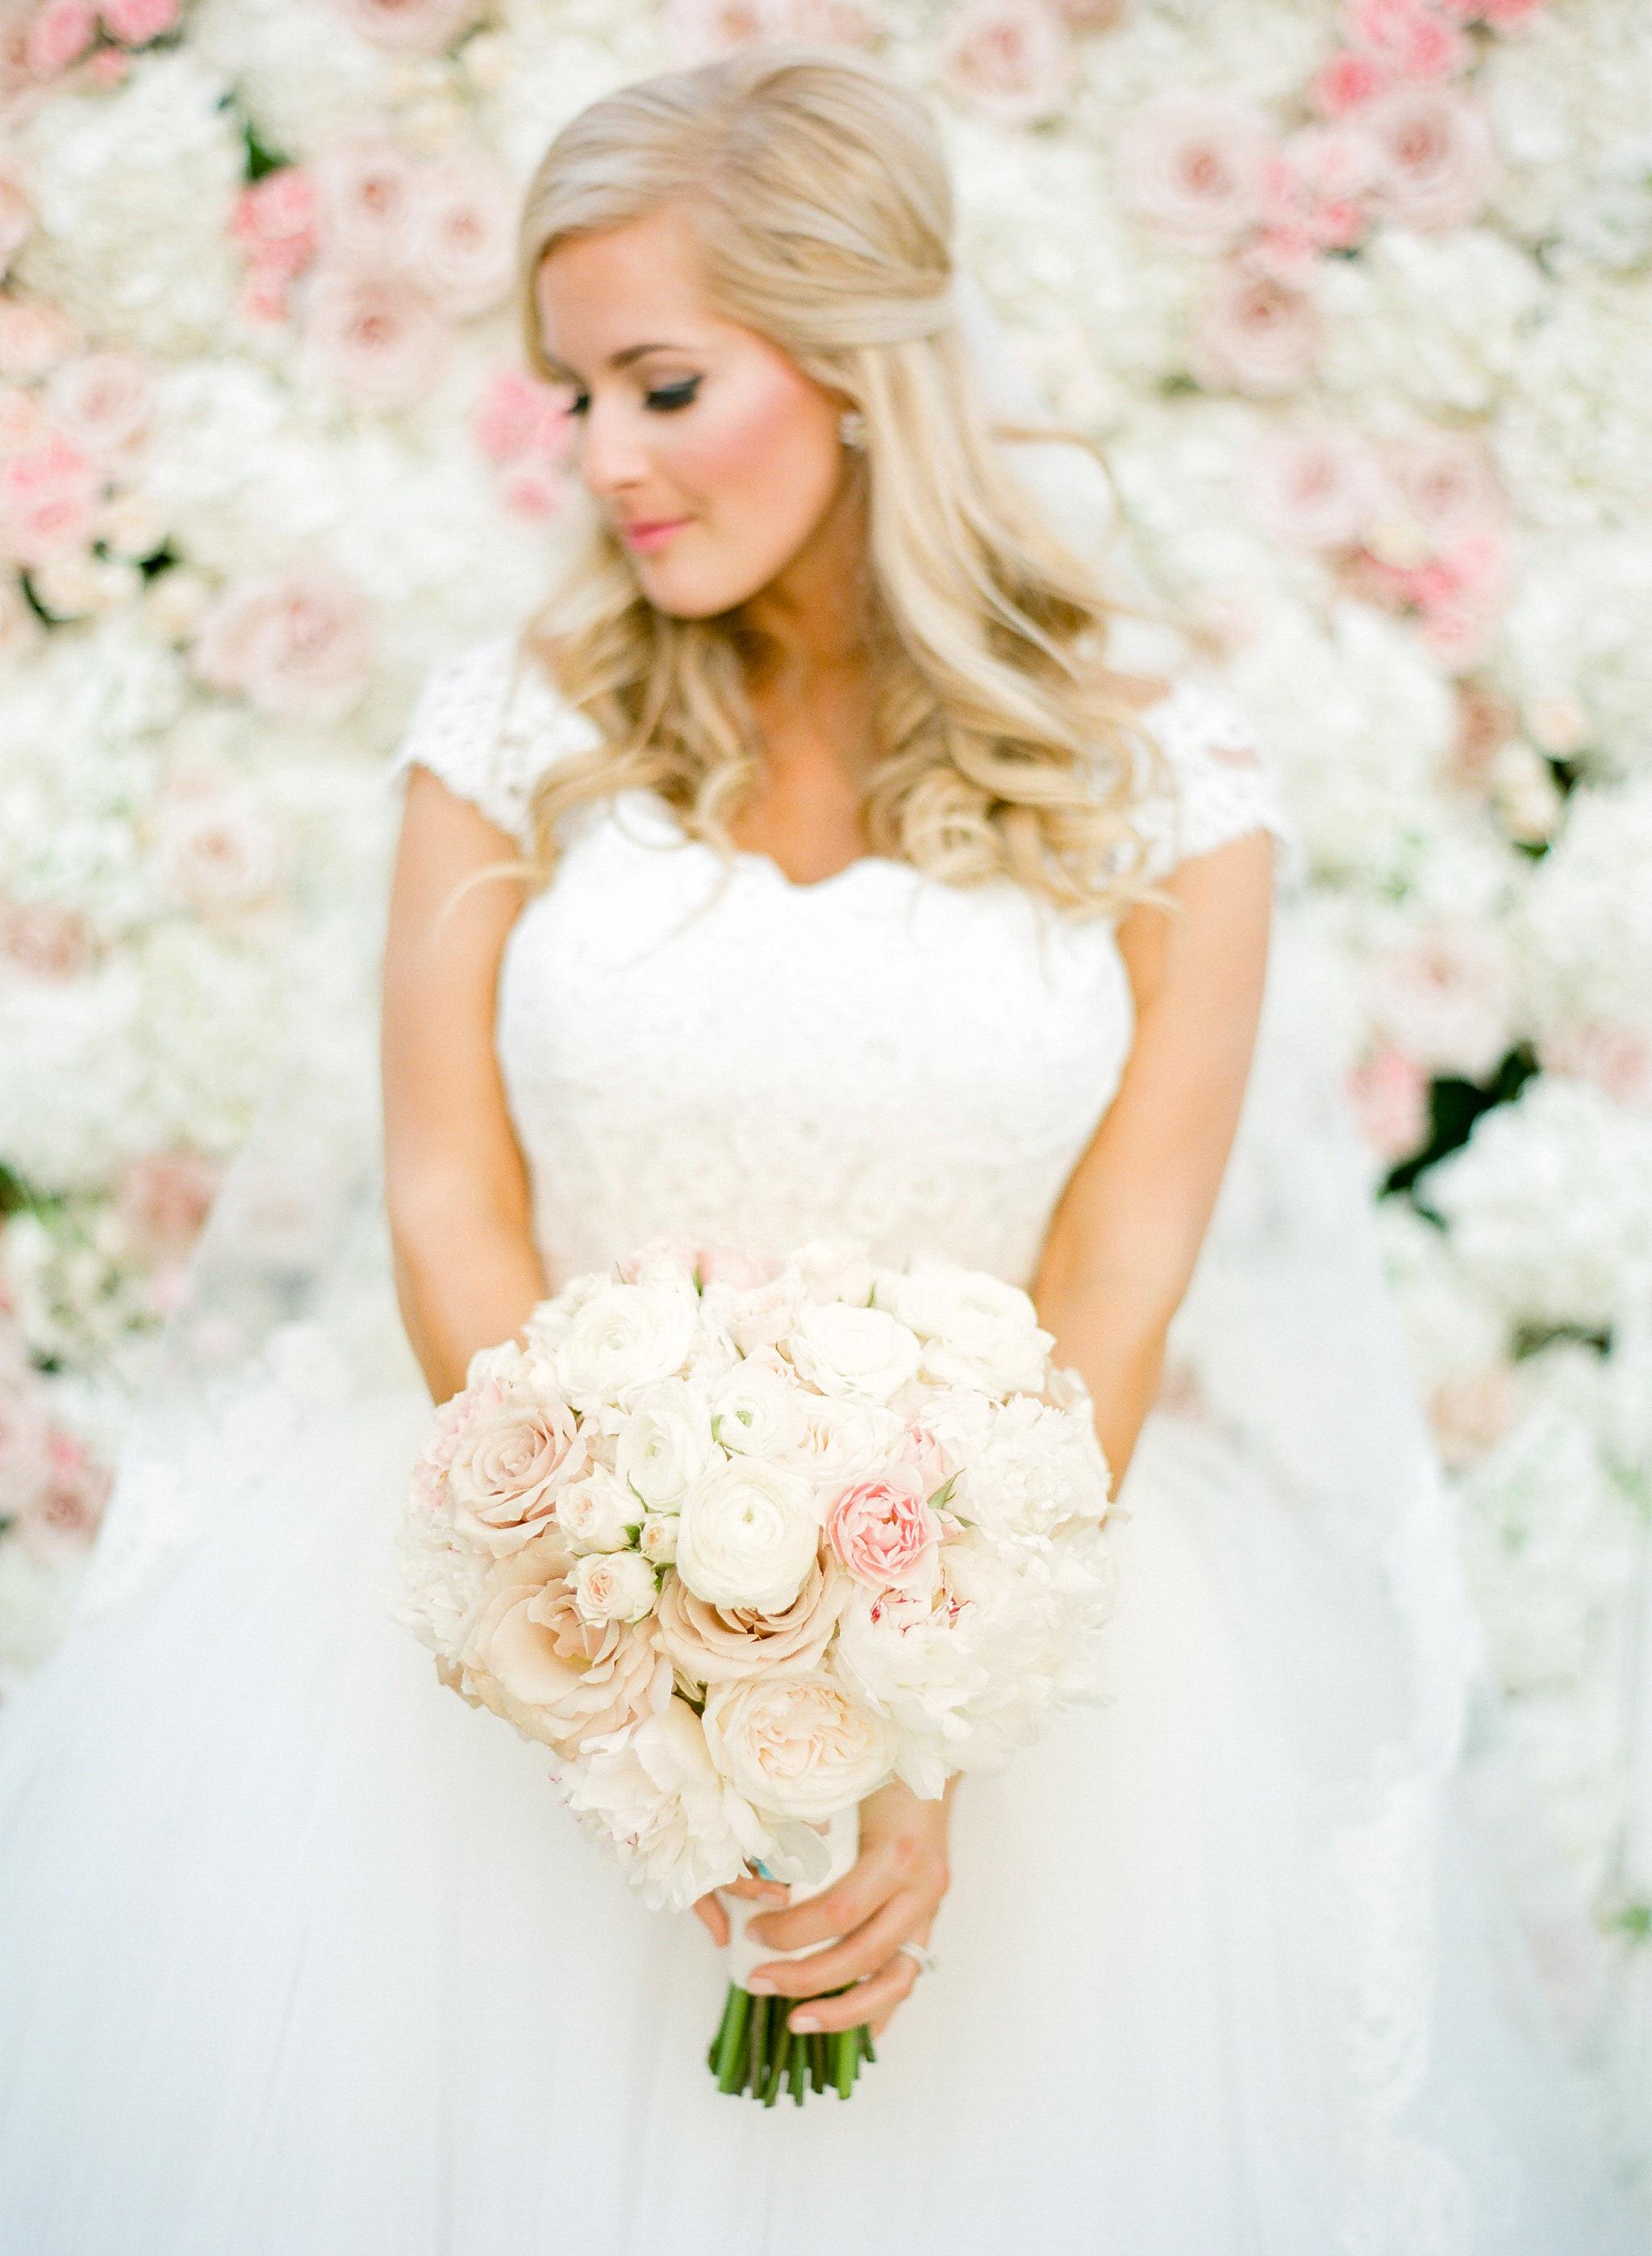 Ceci_New_York_Florida_Wedding_Style_Bride_Watercolor_Real_Custom_Luxury_84.jpg